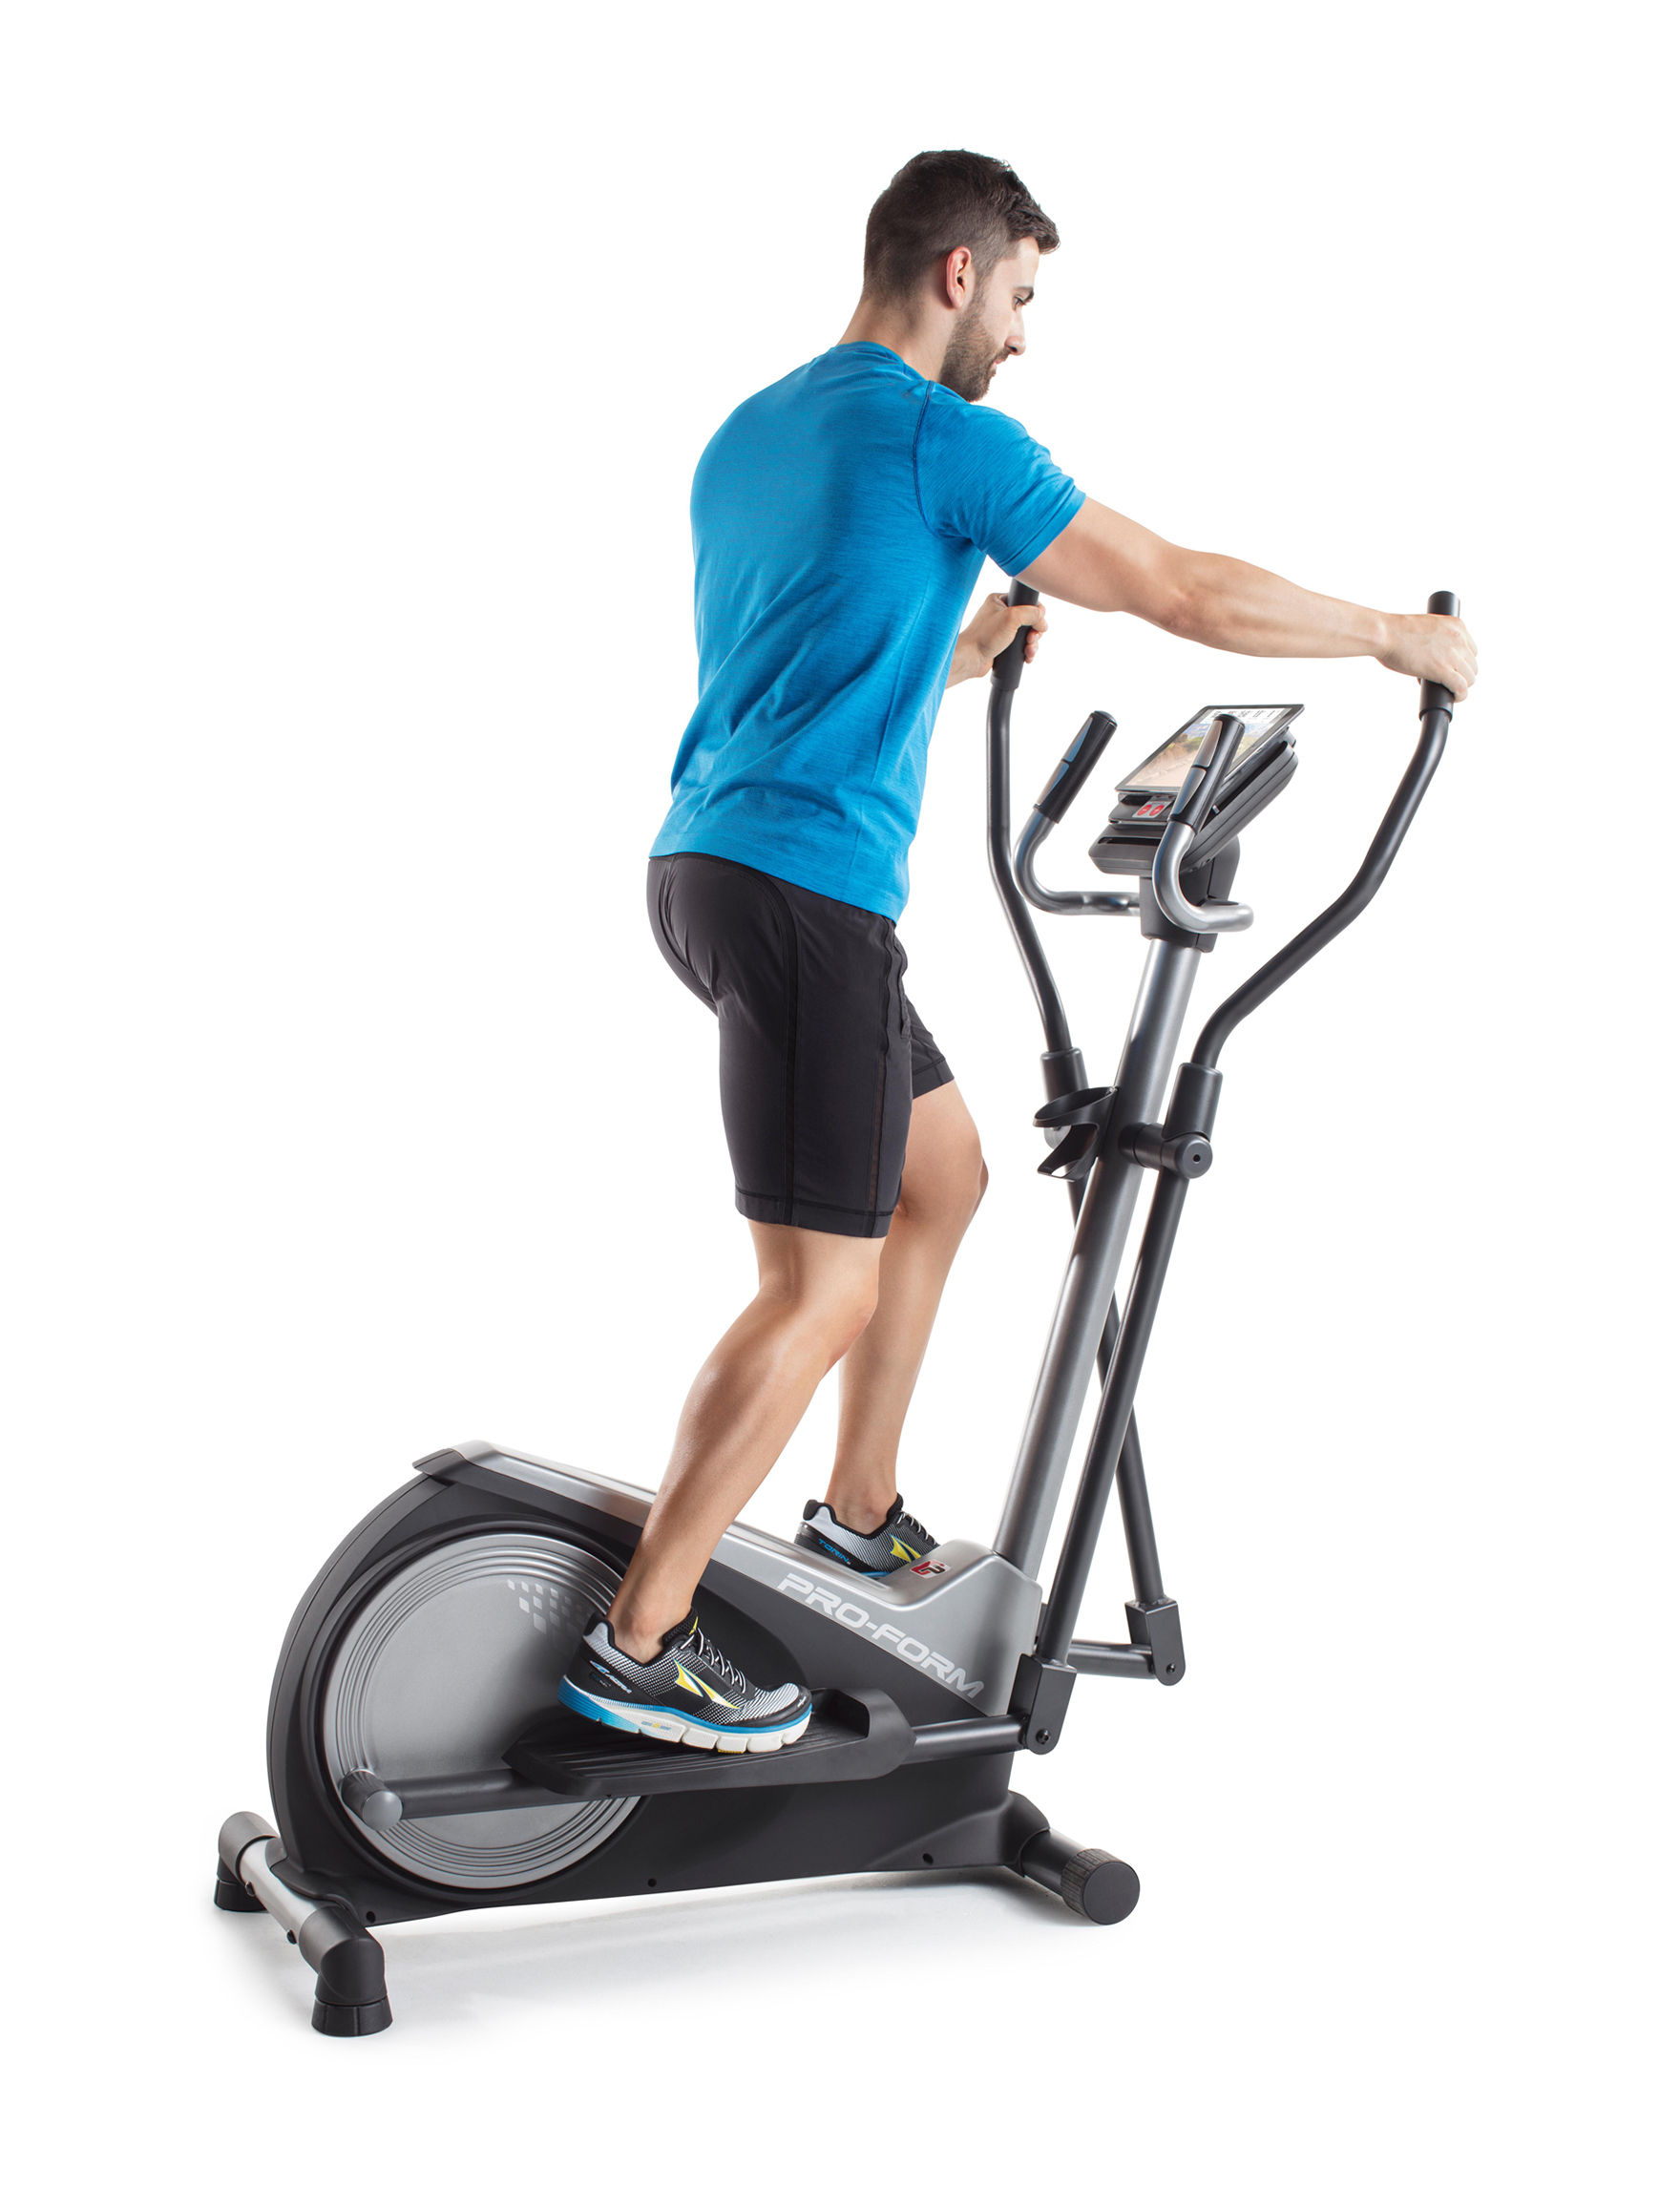 Pro-Form Black Fitness Equipment